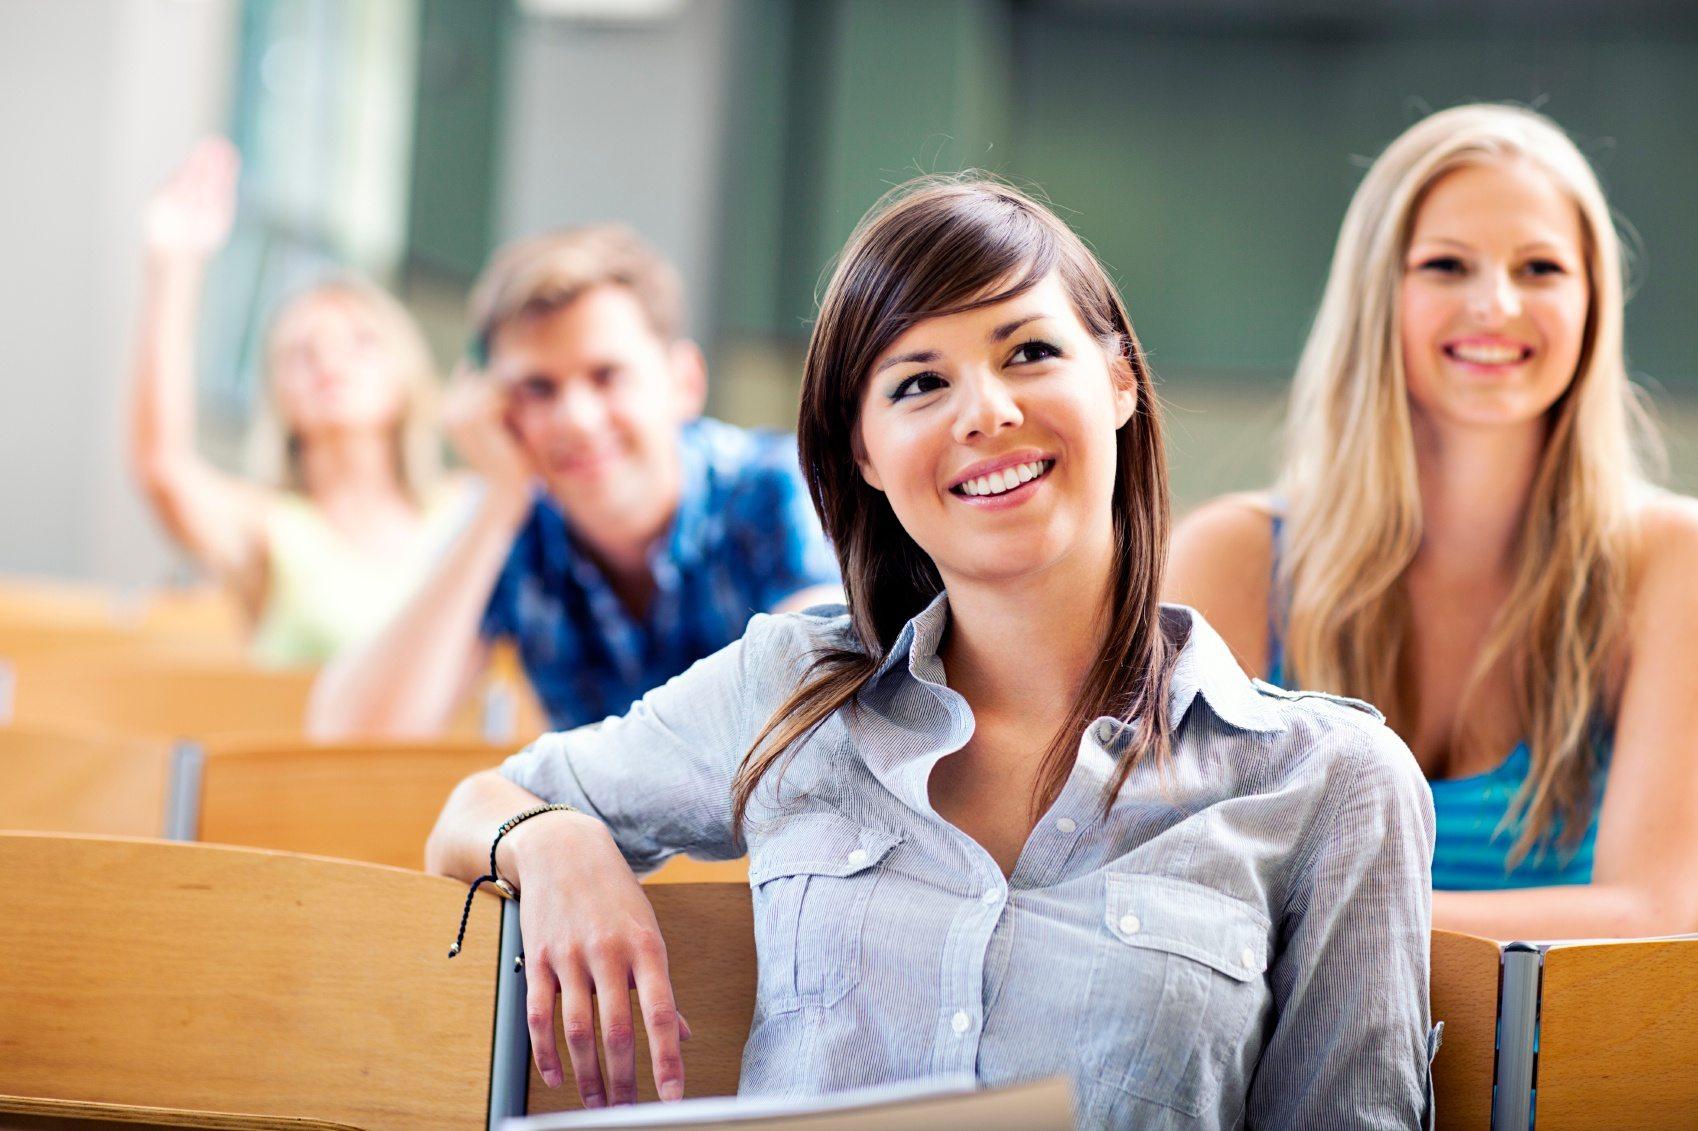 характеристика на студента по учебной практике